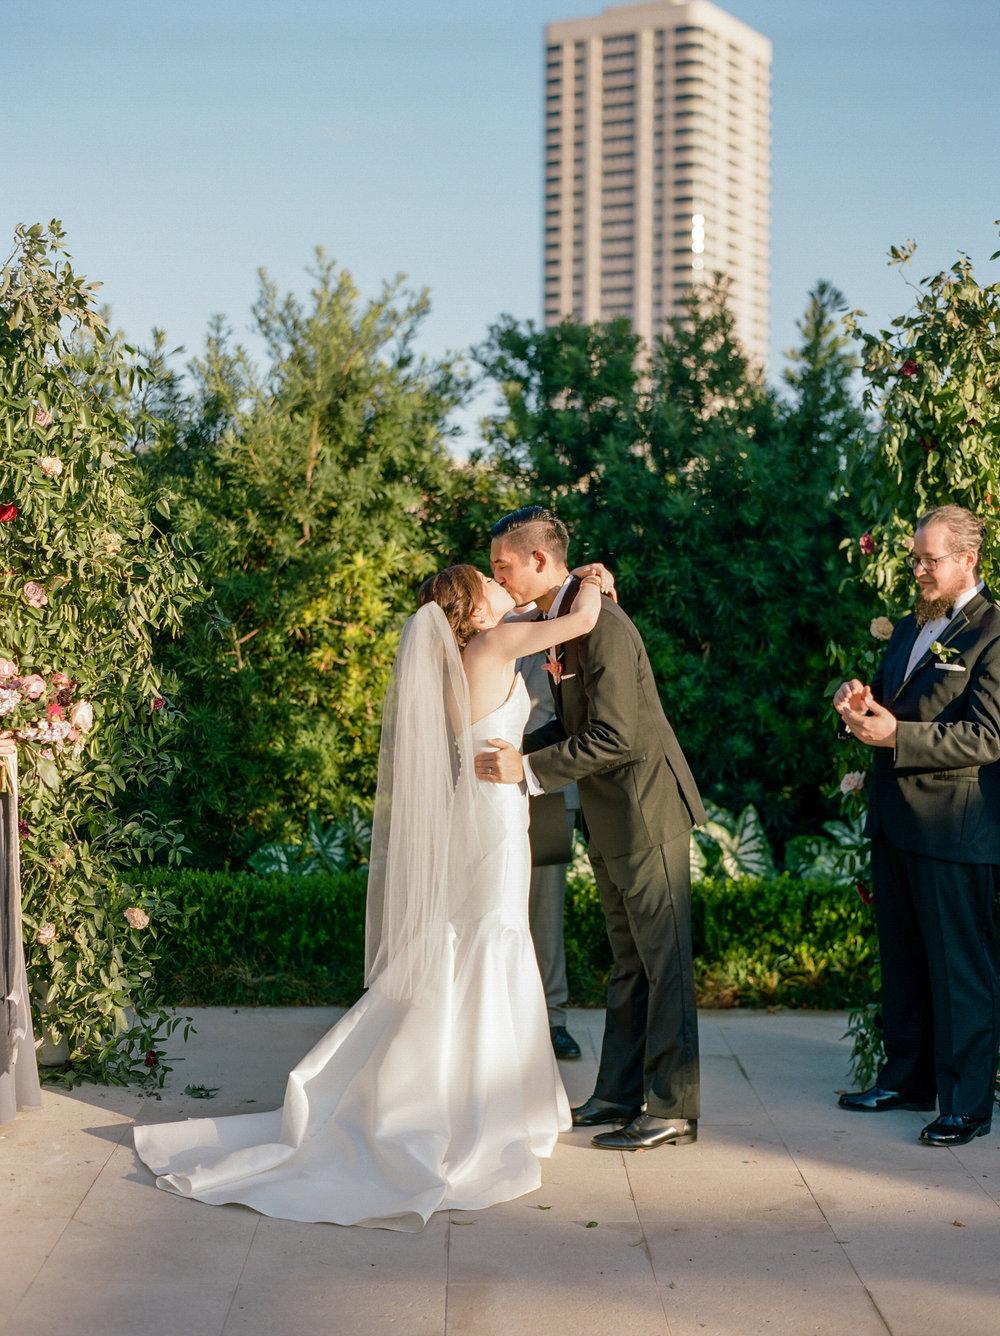 The-Knot-Texas-Magazine-Wedding-Top-Best-Houston-Wedding-Photographer-Fine-Art-Film-Dana-Fernandez-Photography-136.jpg